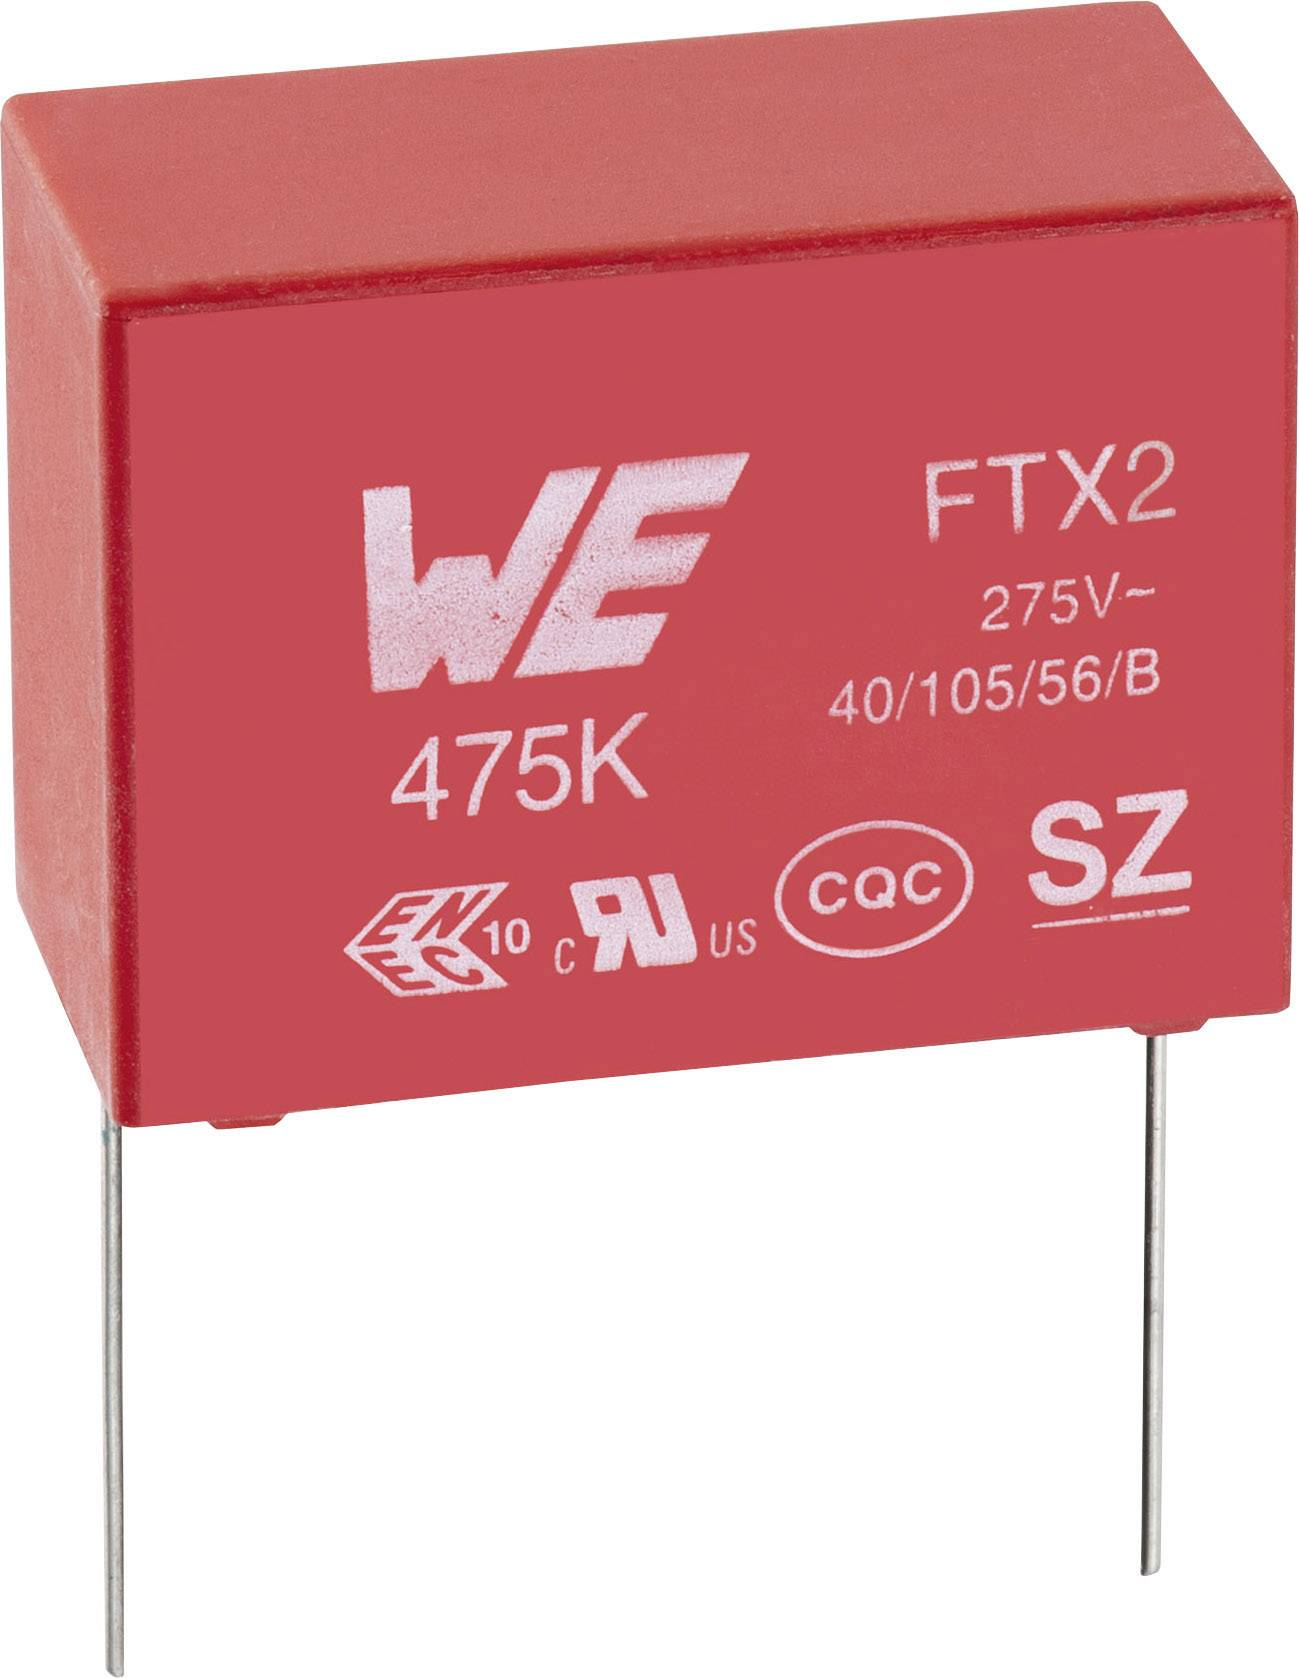 Foliový kondenzátor Würth WCAP-FTX2, 890324023007CS, 12000 pF, 275 V/AC, 10 %, RM 10 mm